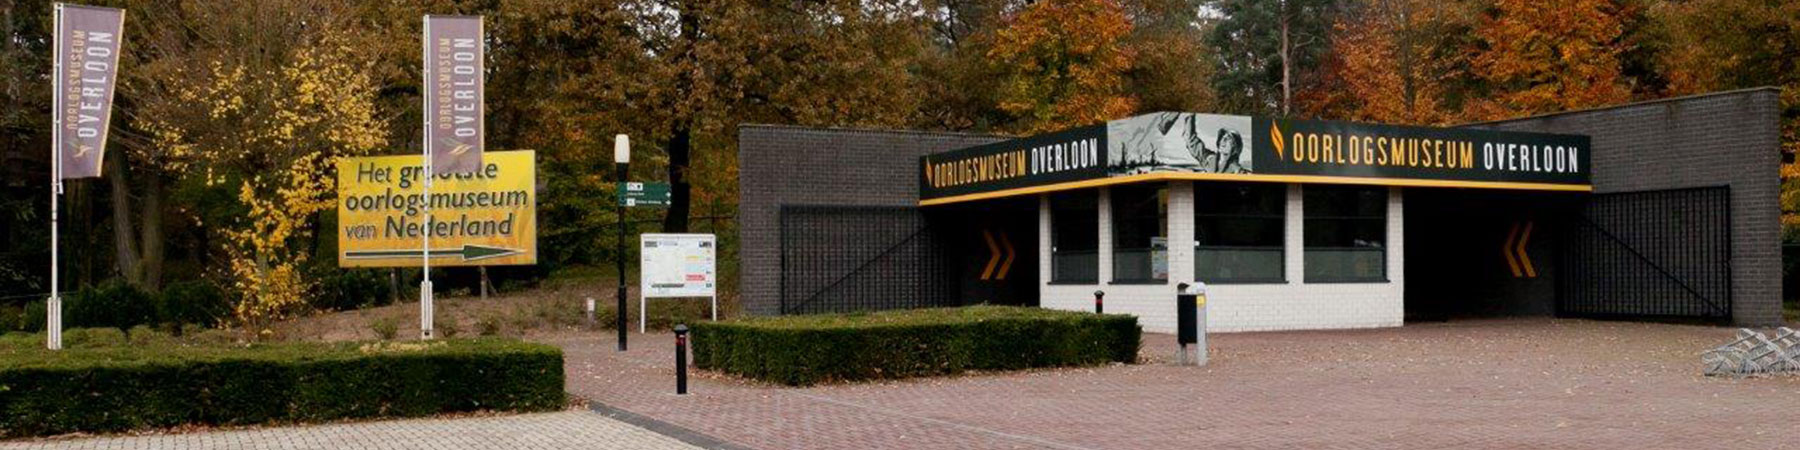 oorlogsmuseum-overloon1